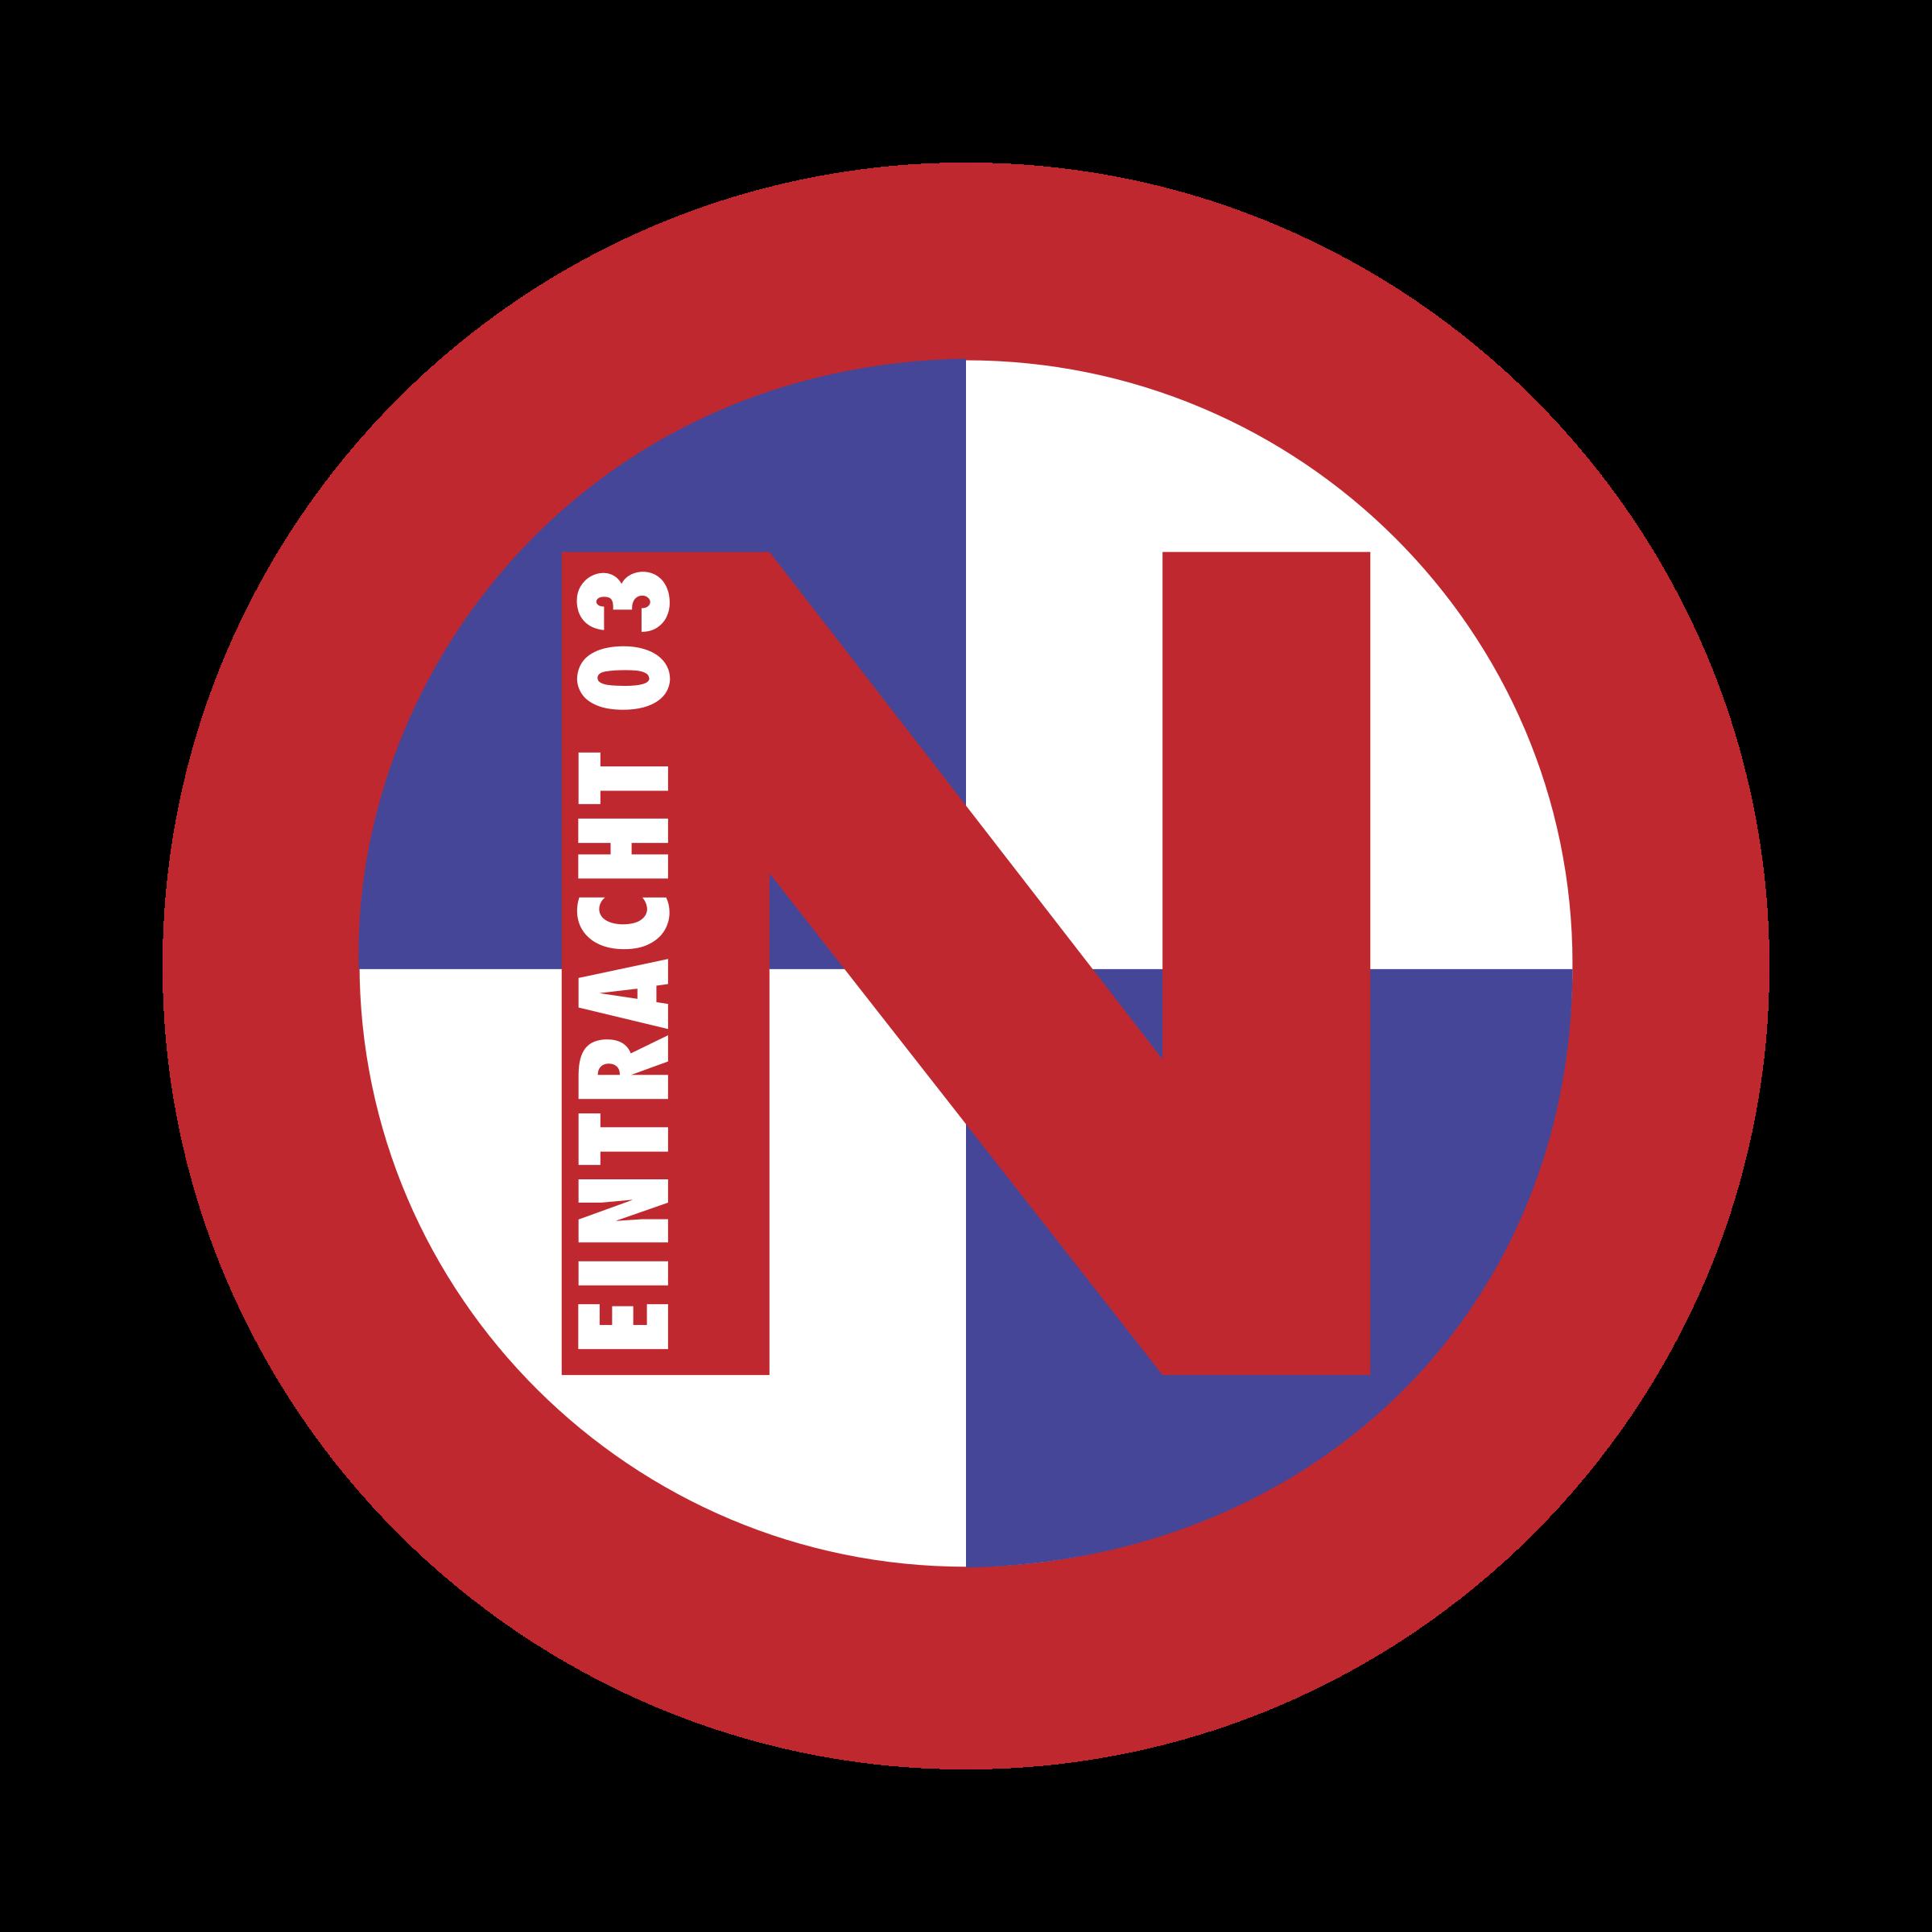 Eintracht Norderstedt Logo Png Transparent & Svg Vector - Freebie Pluspng.com  - Eintracht Logo PNG